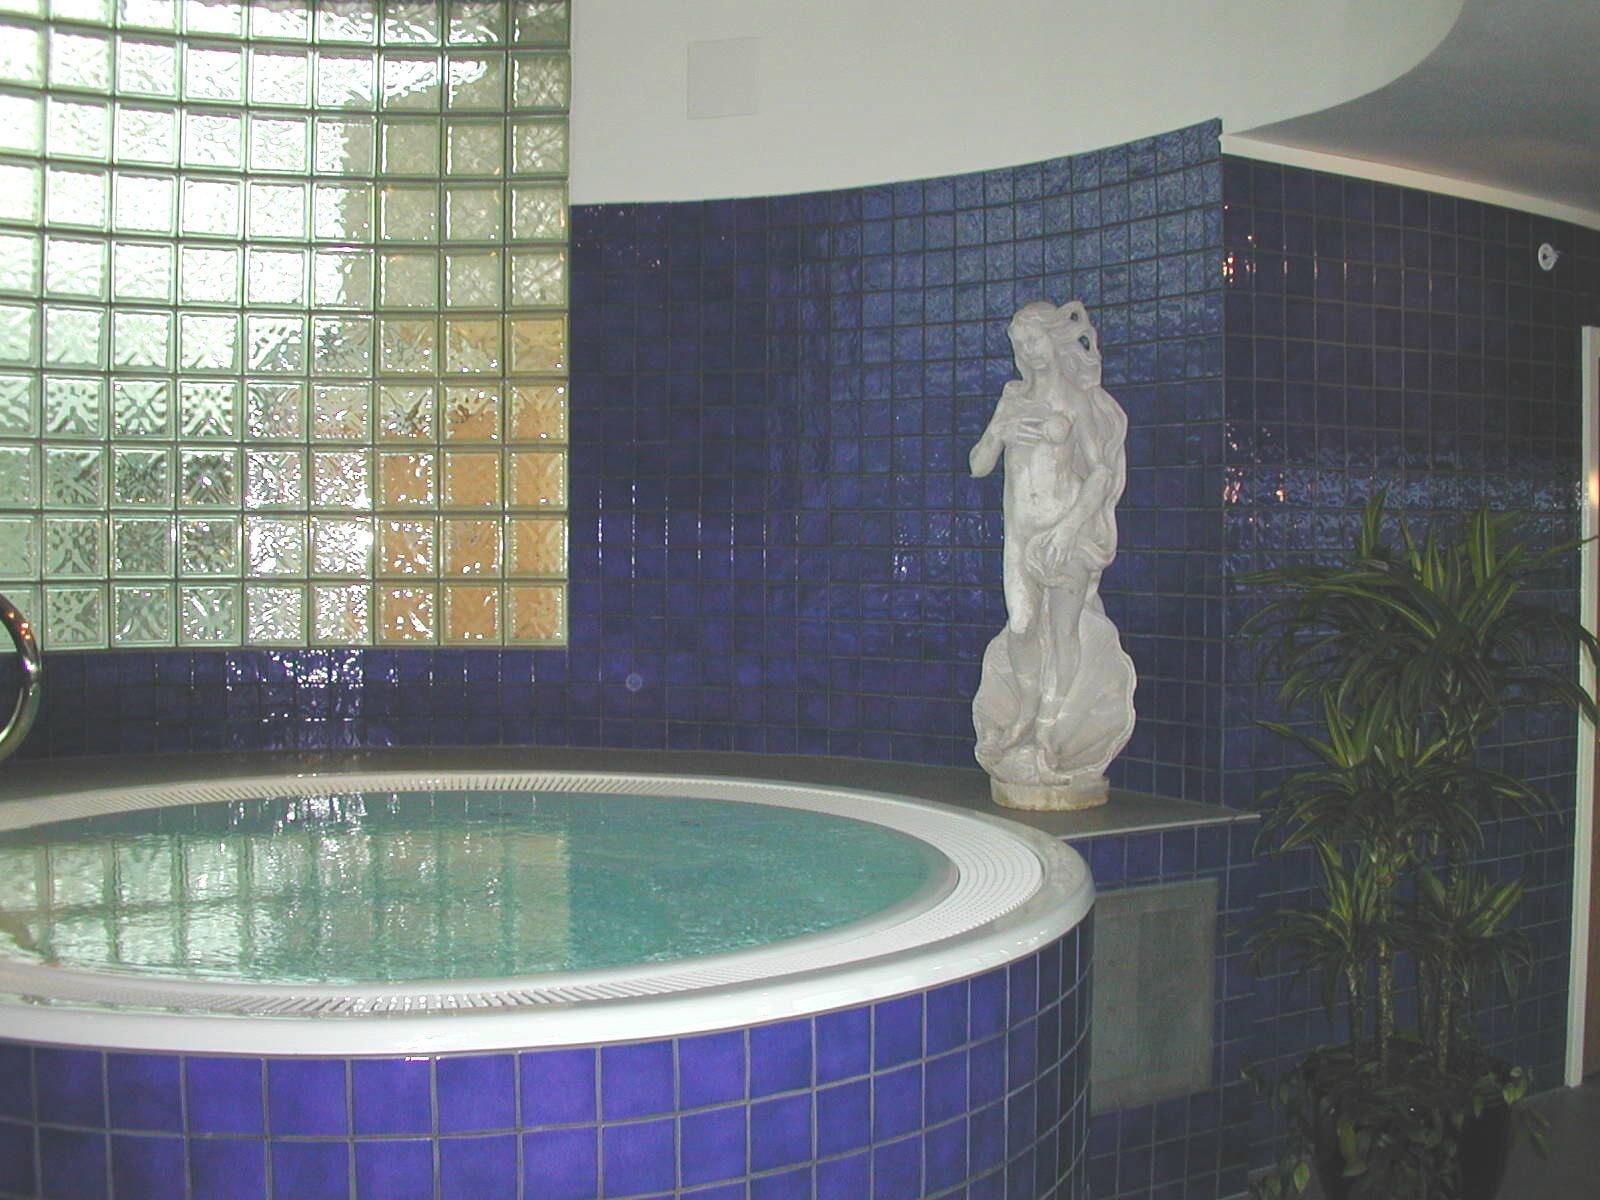 Scandic Hotel Mölndal